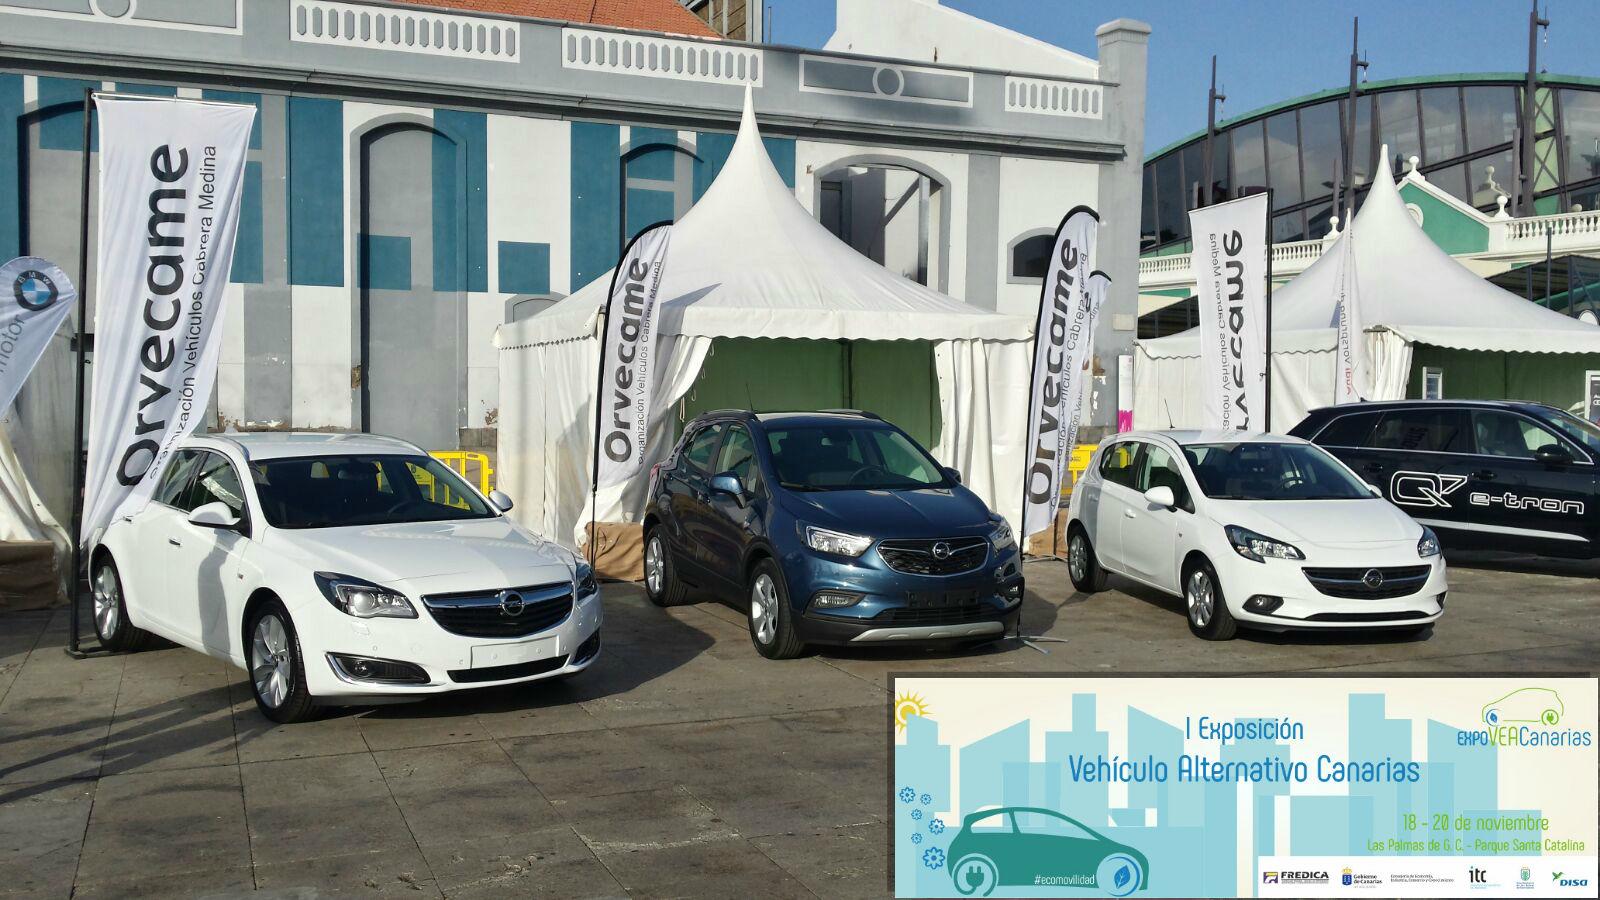 Orvecame Gran Canaria participa en la I Exposición Vehículo Alternativo Canarias – ExpoVEACanarias.